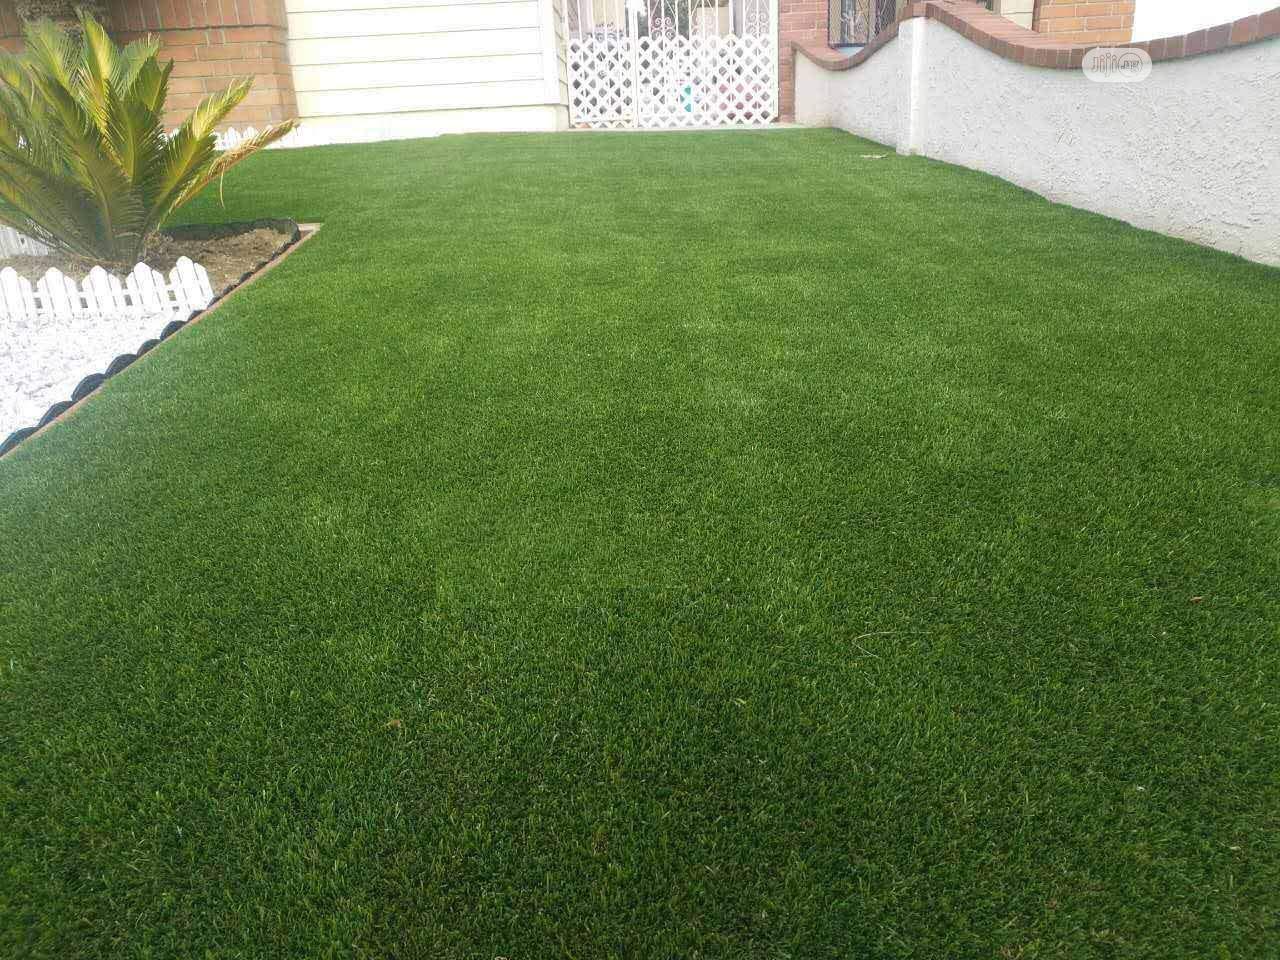 Original & Quality Artificial Green Grass Carpet Lawn.